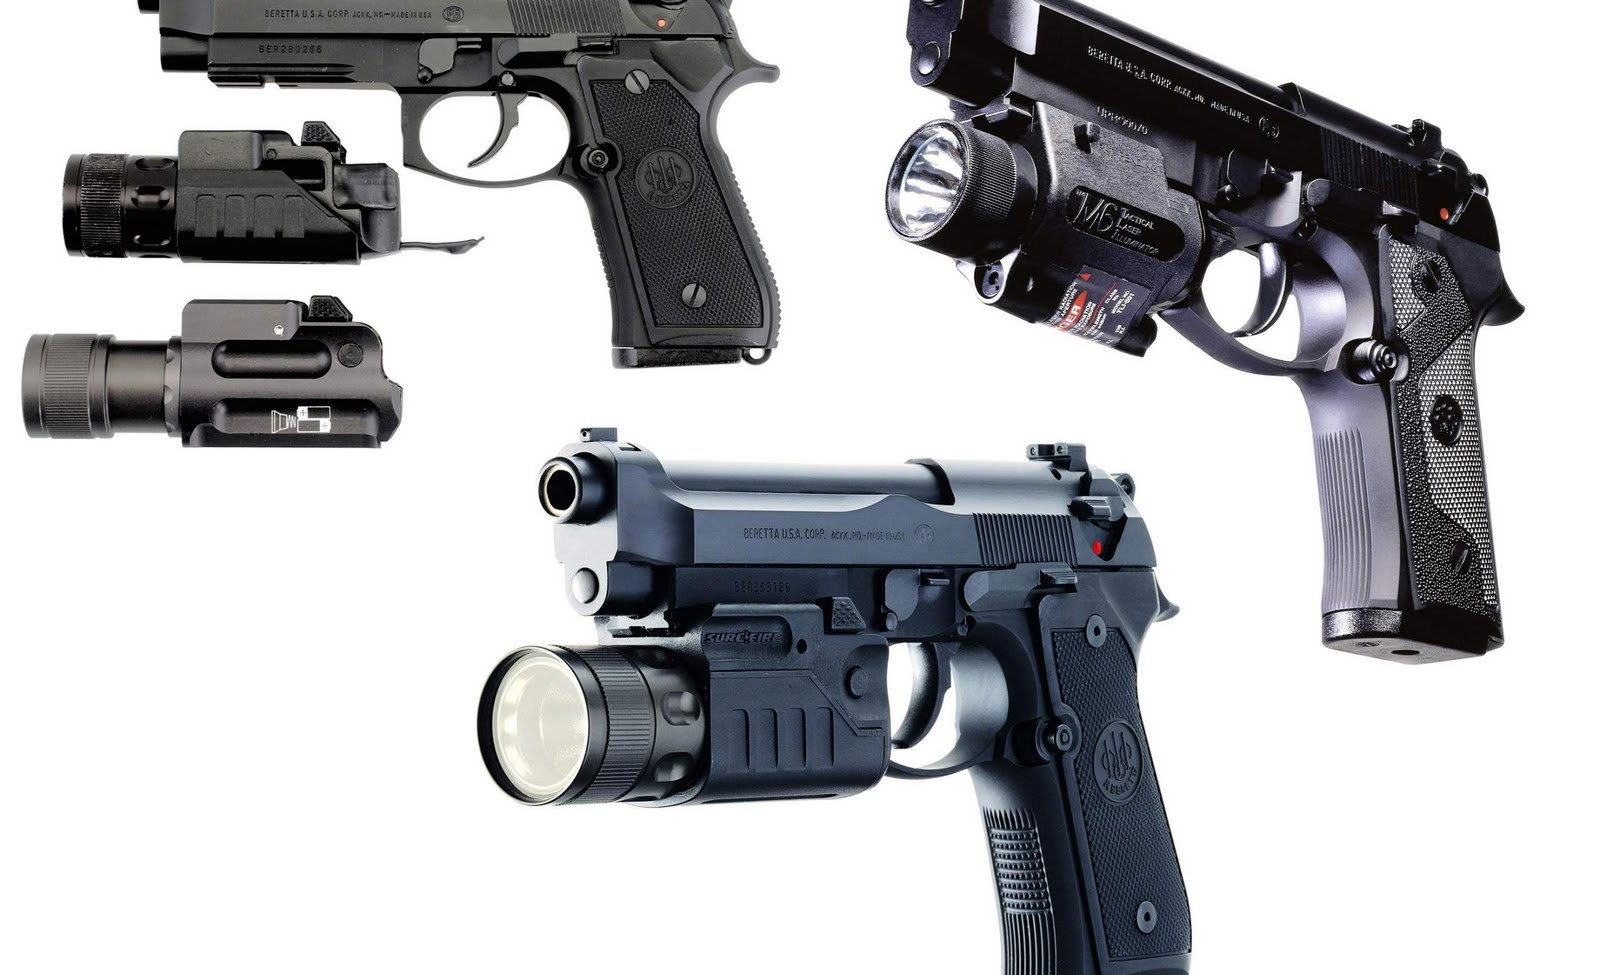 http://4.bp.blogspot.com/-_RiZsPGCbwg/Tj9zI1WYeaI/AAAAAAAAAsc/CaQWszBrWHs/s1600/Pistols_Customized_torch2560_1600.jpg